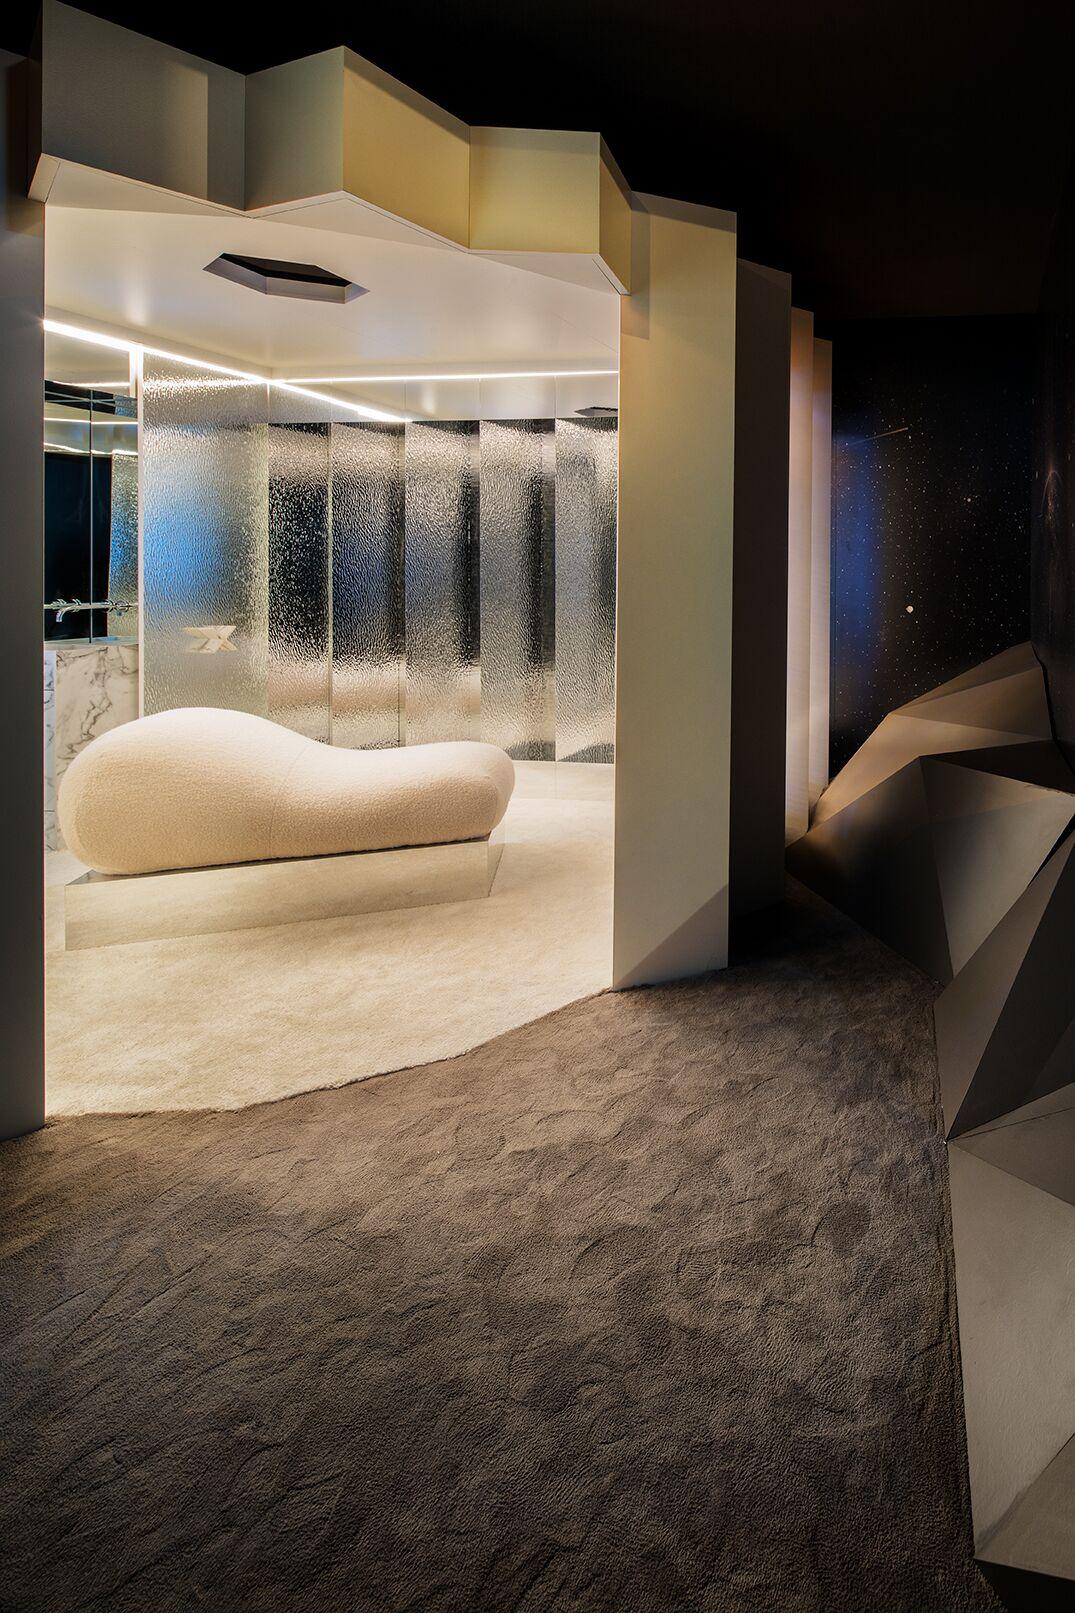 espacio formica Casa Decor 2020 Estudio Wanna